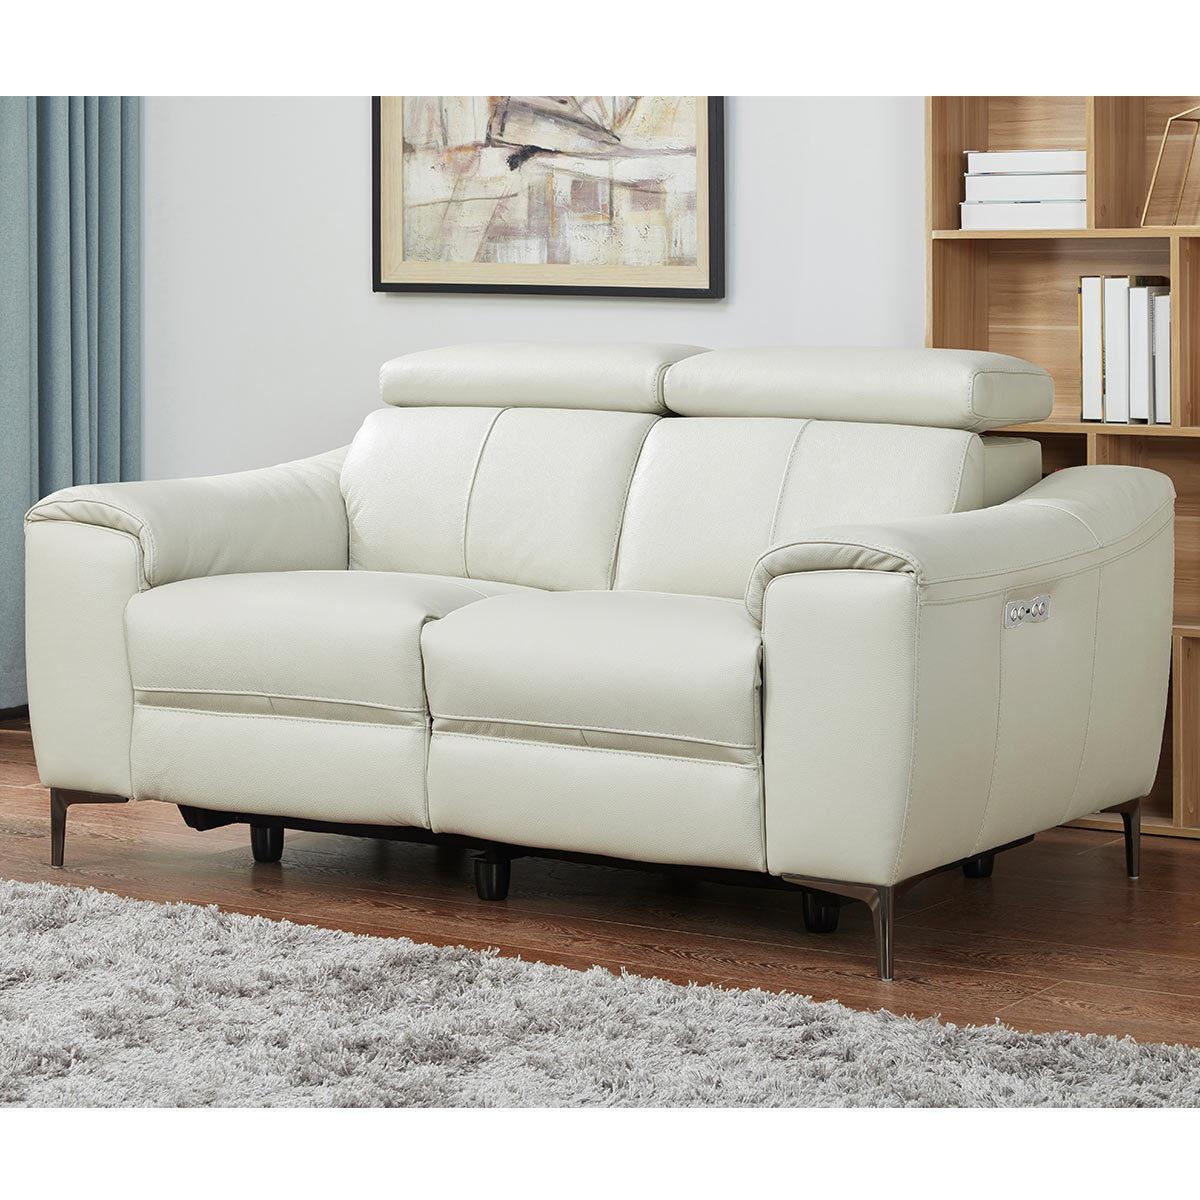 kuka warren 2 seater light grey leather power reclining sofa costco uk